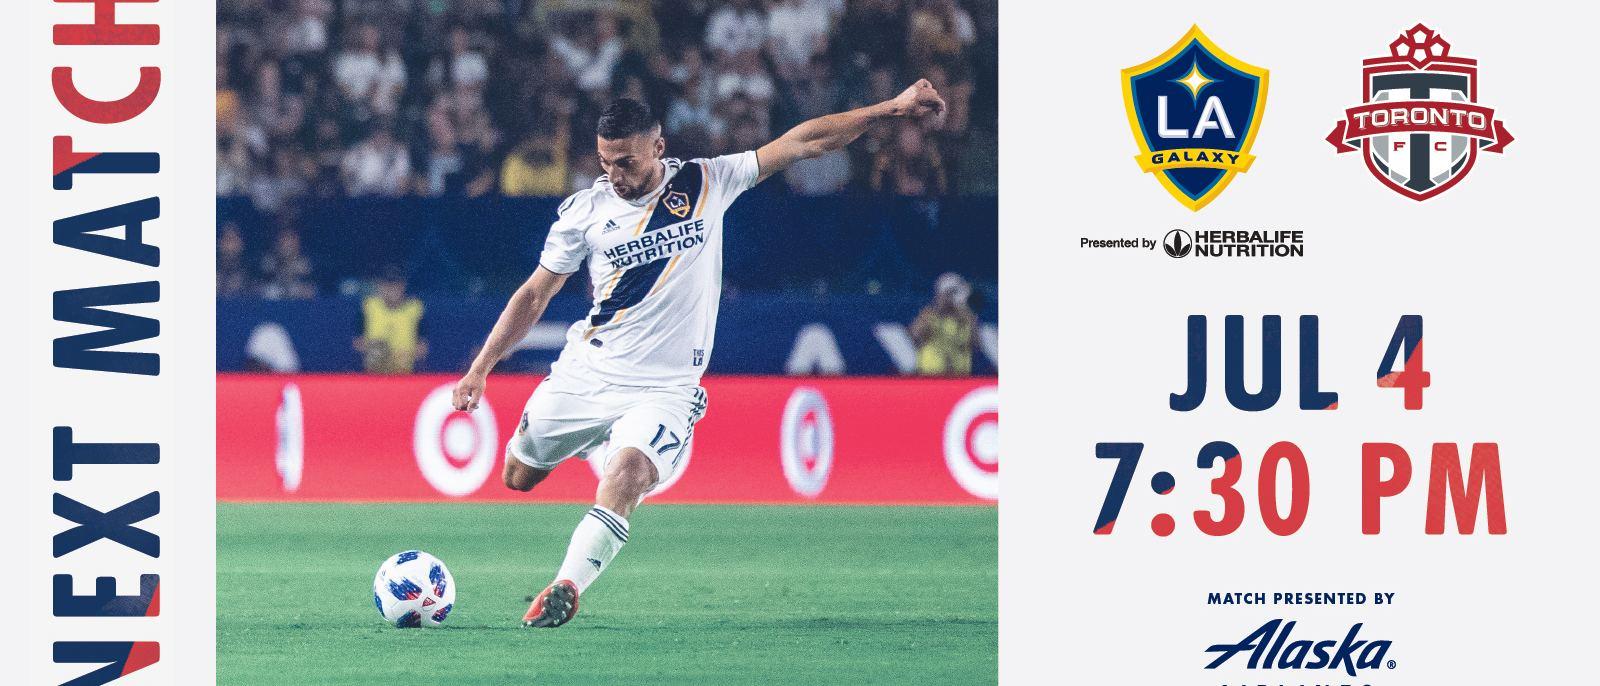 LA Galaxy vs Toronto FC at Dignity Health Sports Park on July 4, 2019